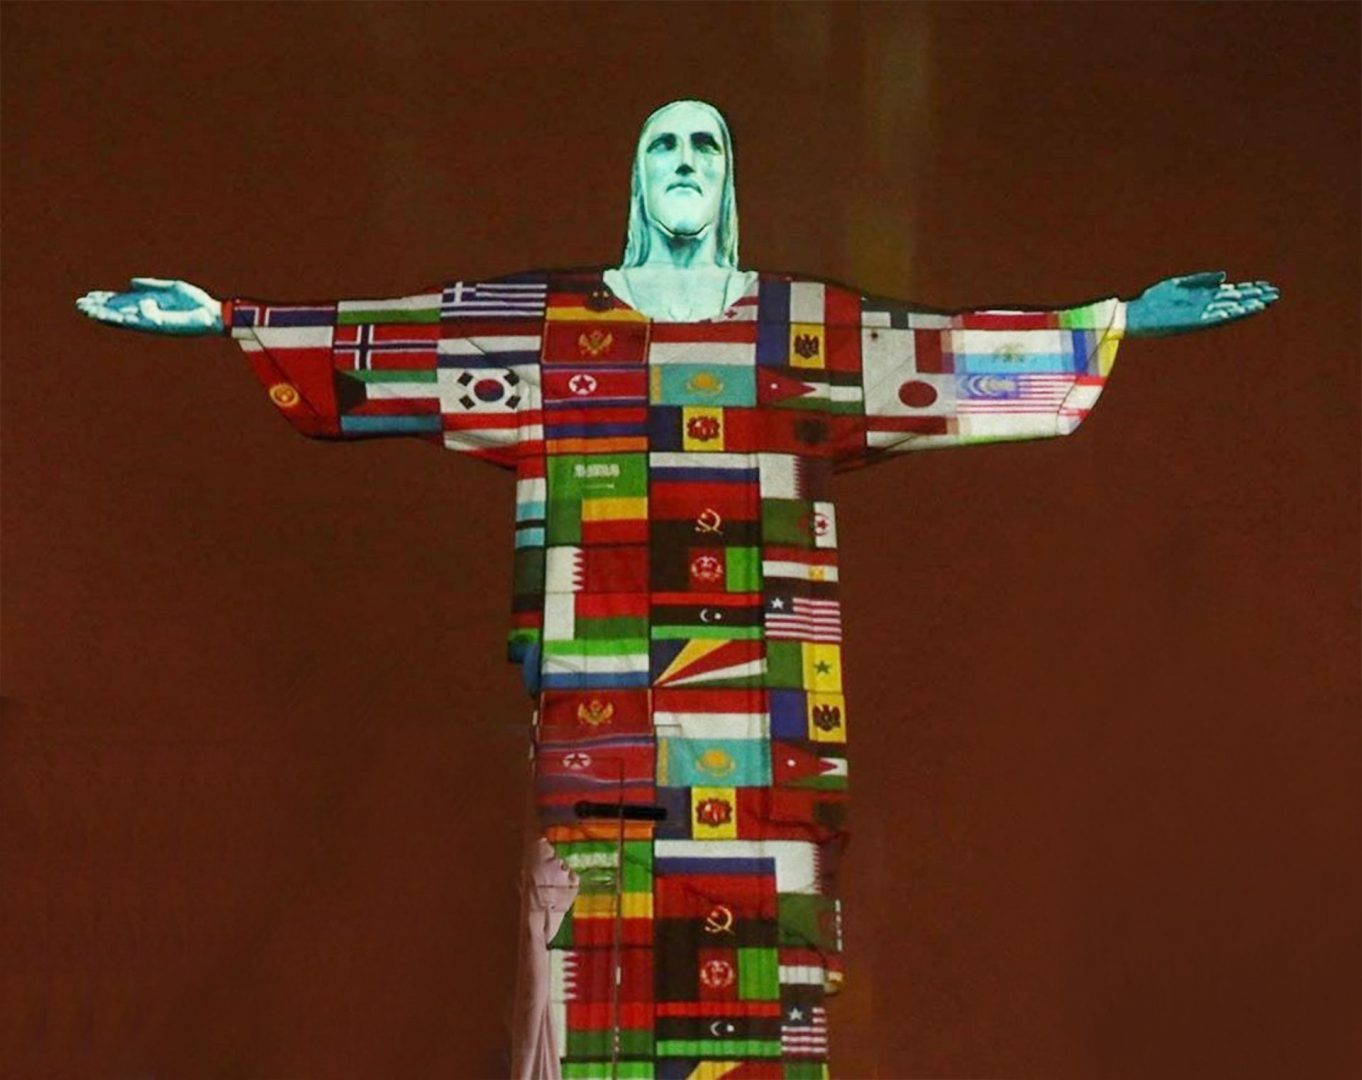 6BEE4605 D9E3 46F3 9676 D049E2369B40 scaled Cristo Redentor é iluminado com bandeiras de países afetados pelo coronavírus